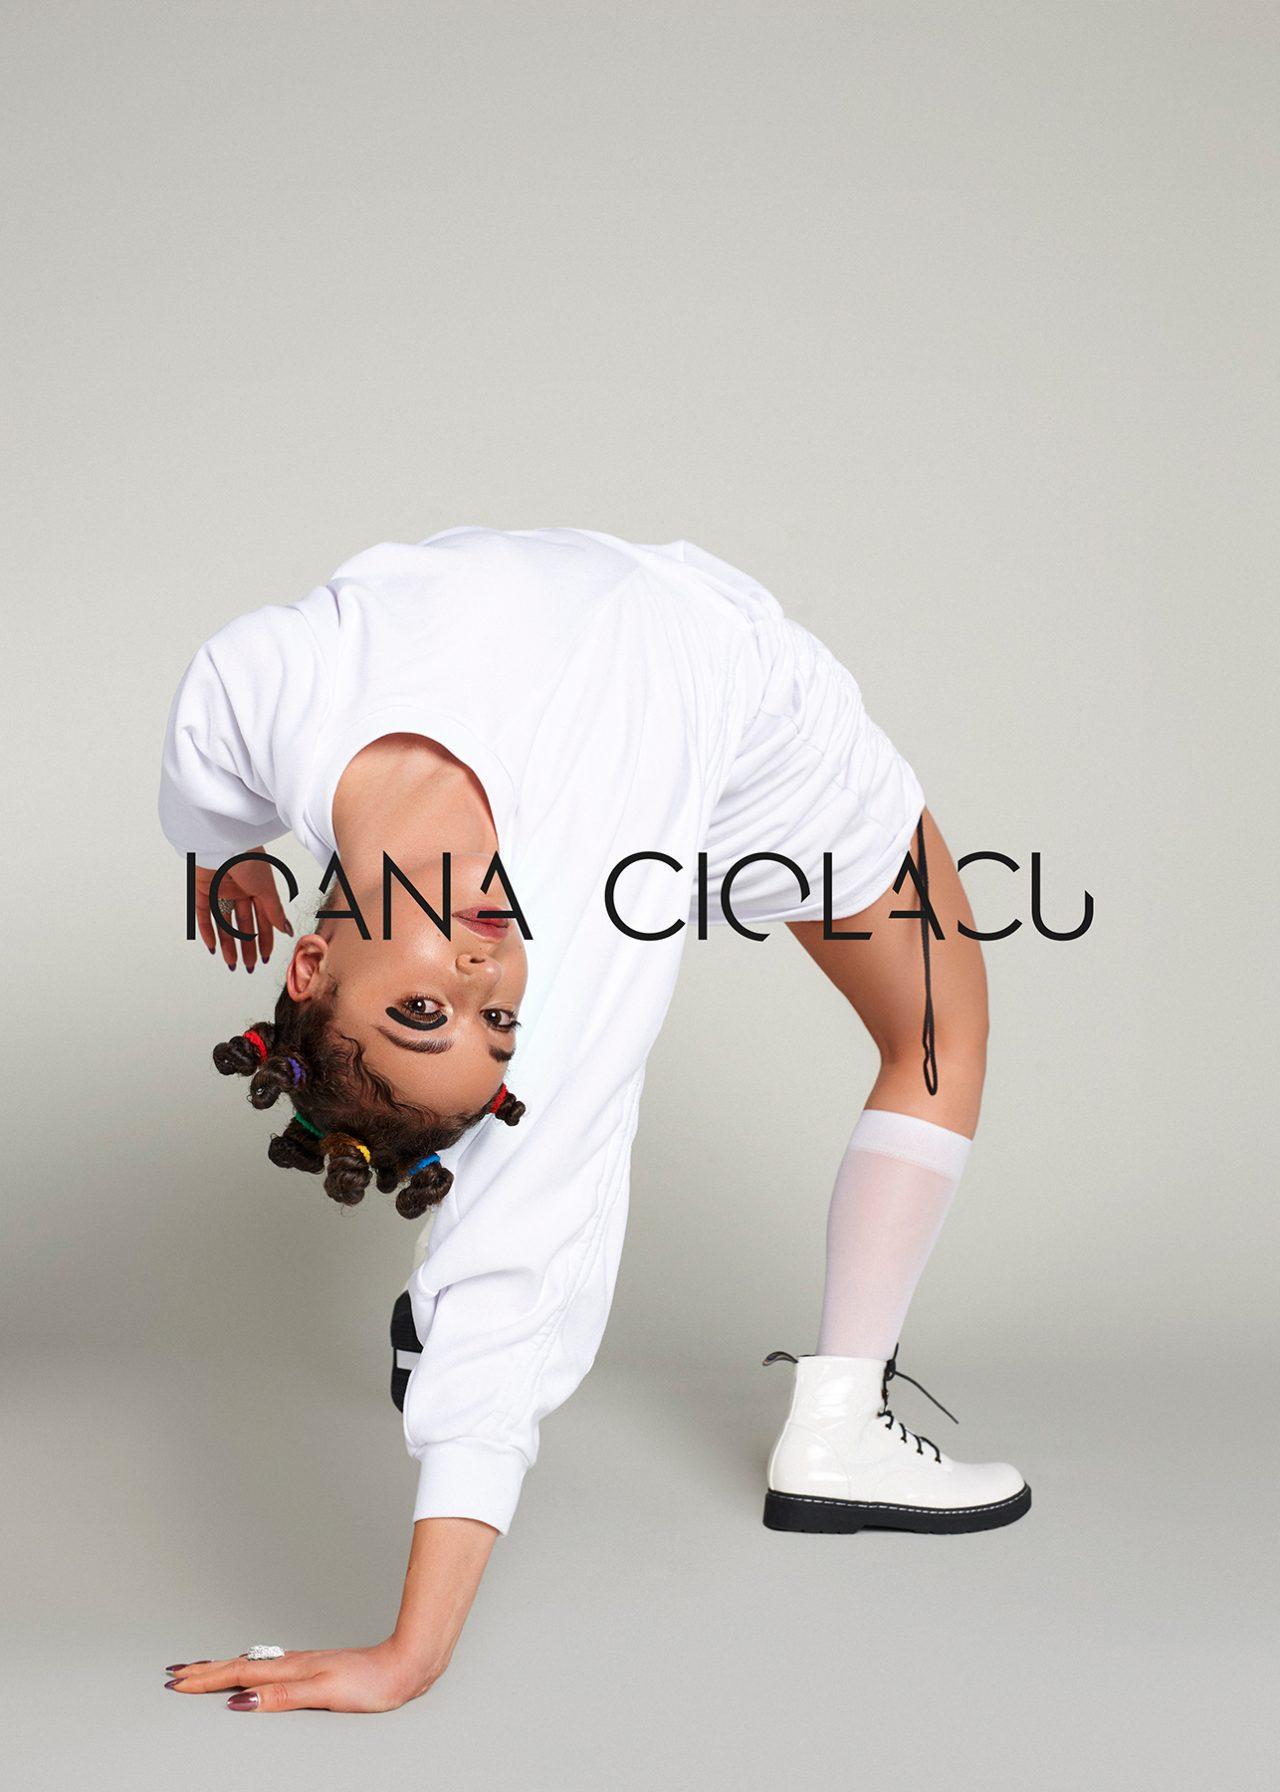 5_Ioana-Ciolacu-SS-19-Campaign- (12)